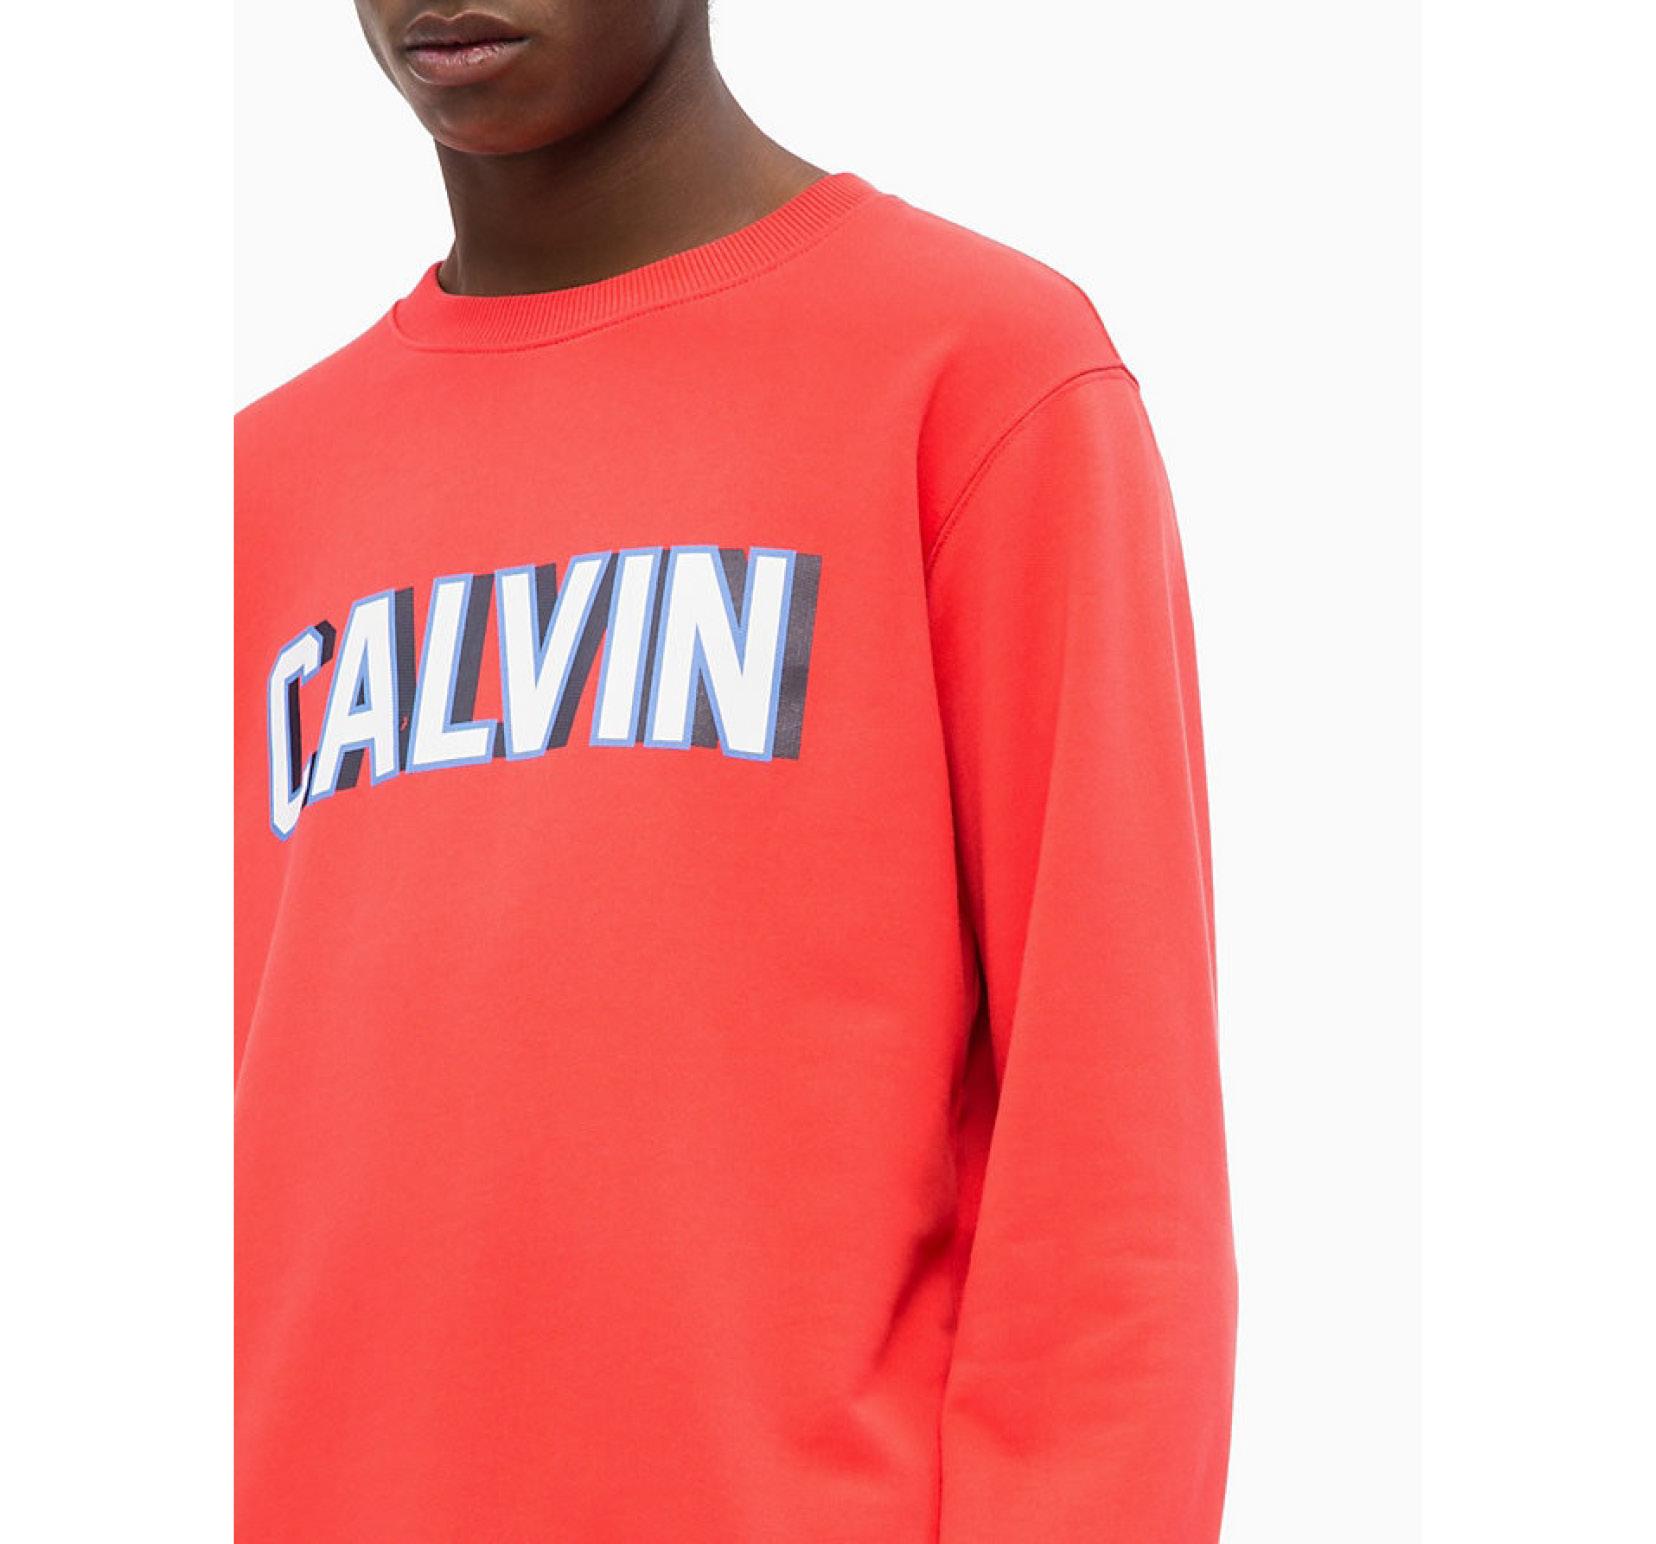 /men-calvin-klein-jeans-capsule-collection